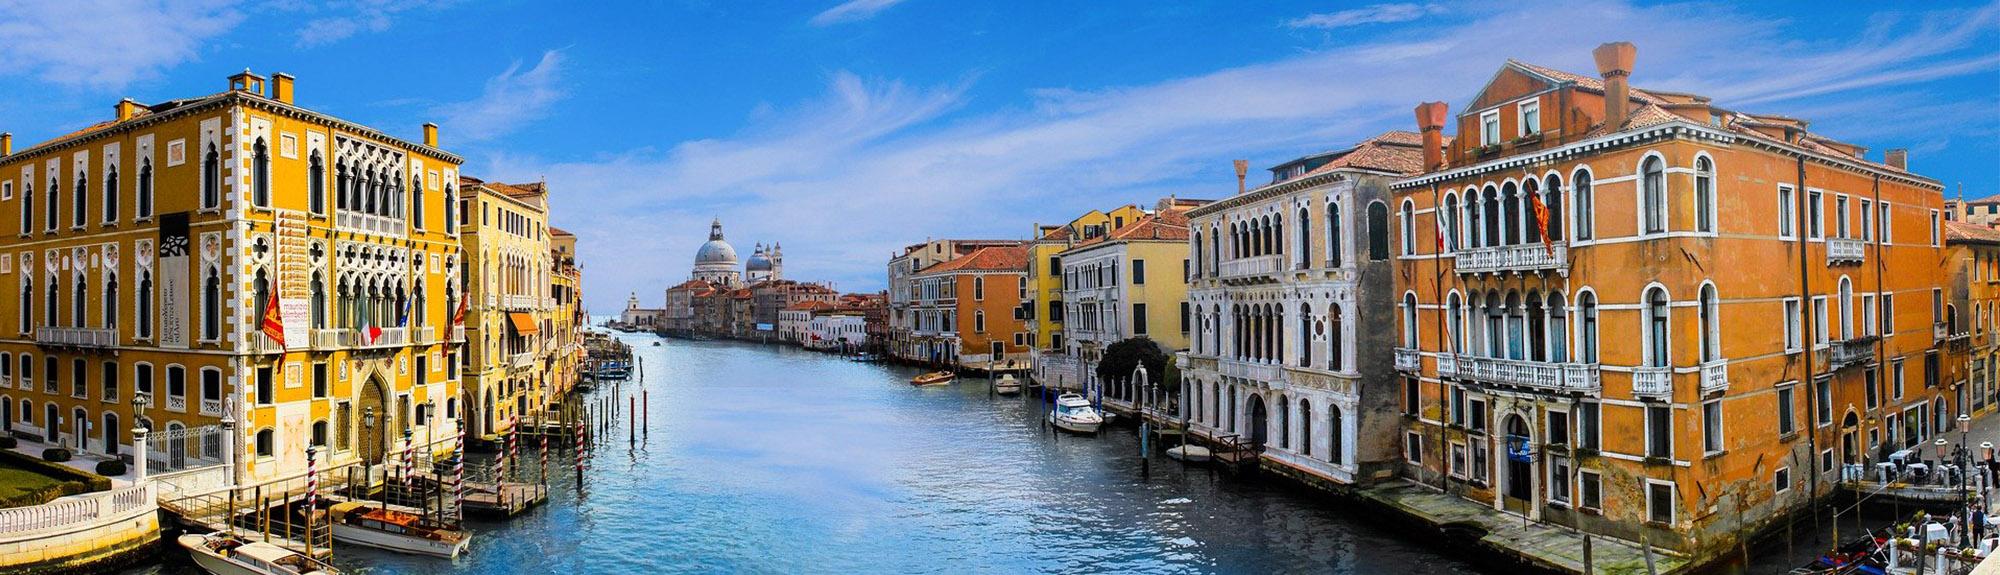 Venice Discount Cards - City Pass